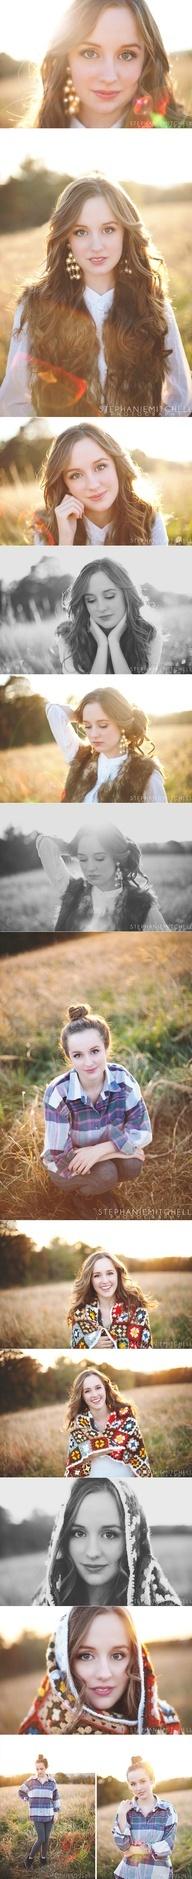 senior photography inspiration #photogpinspiration